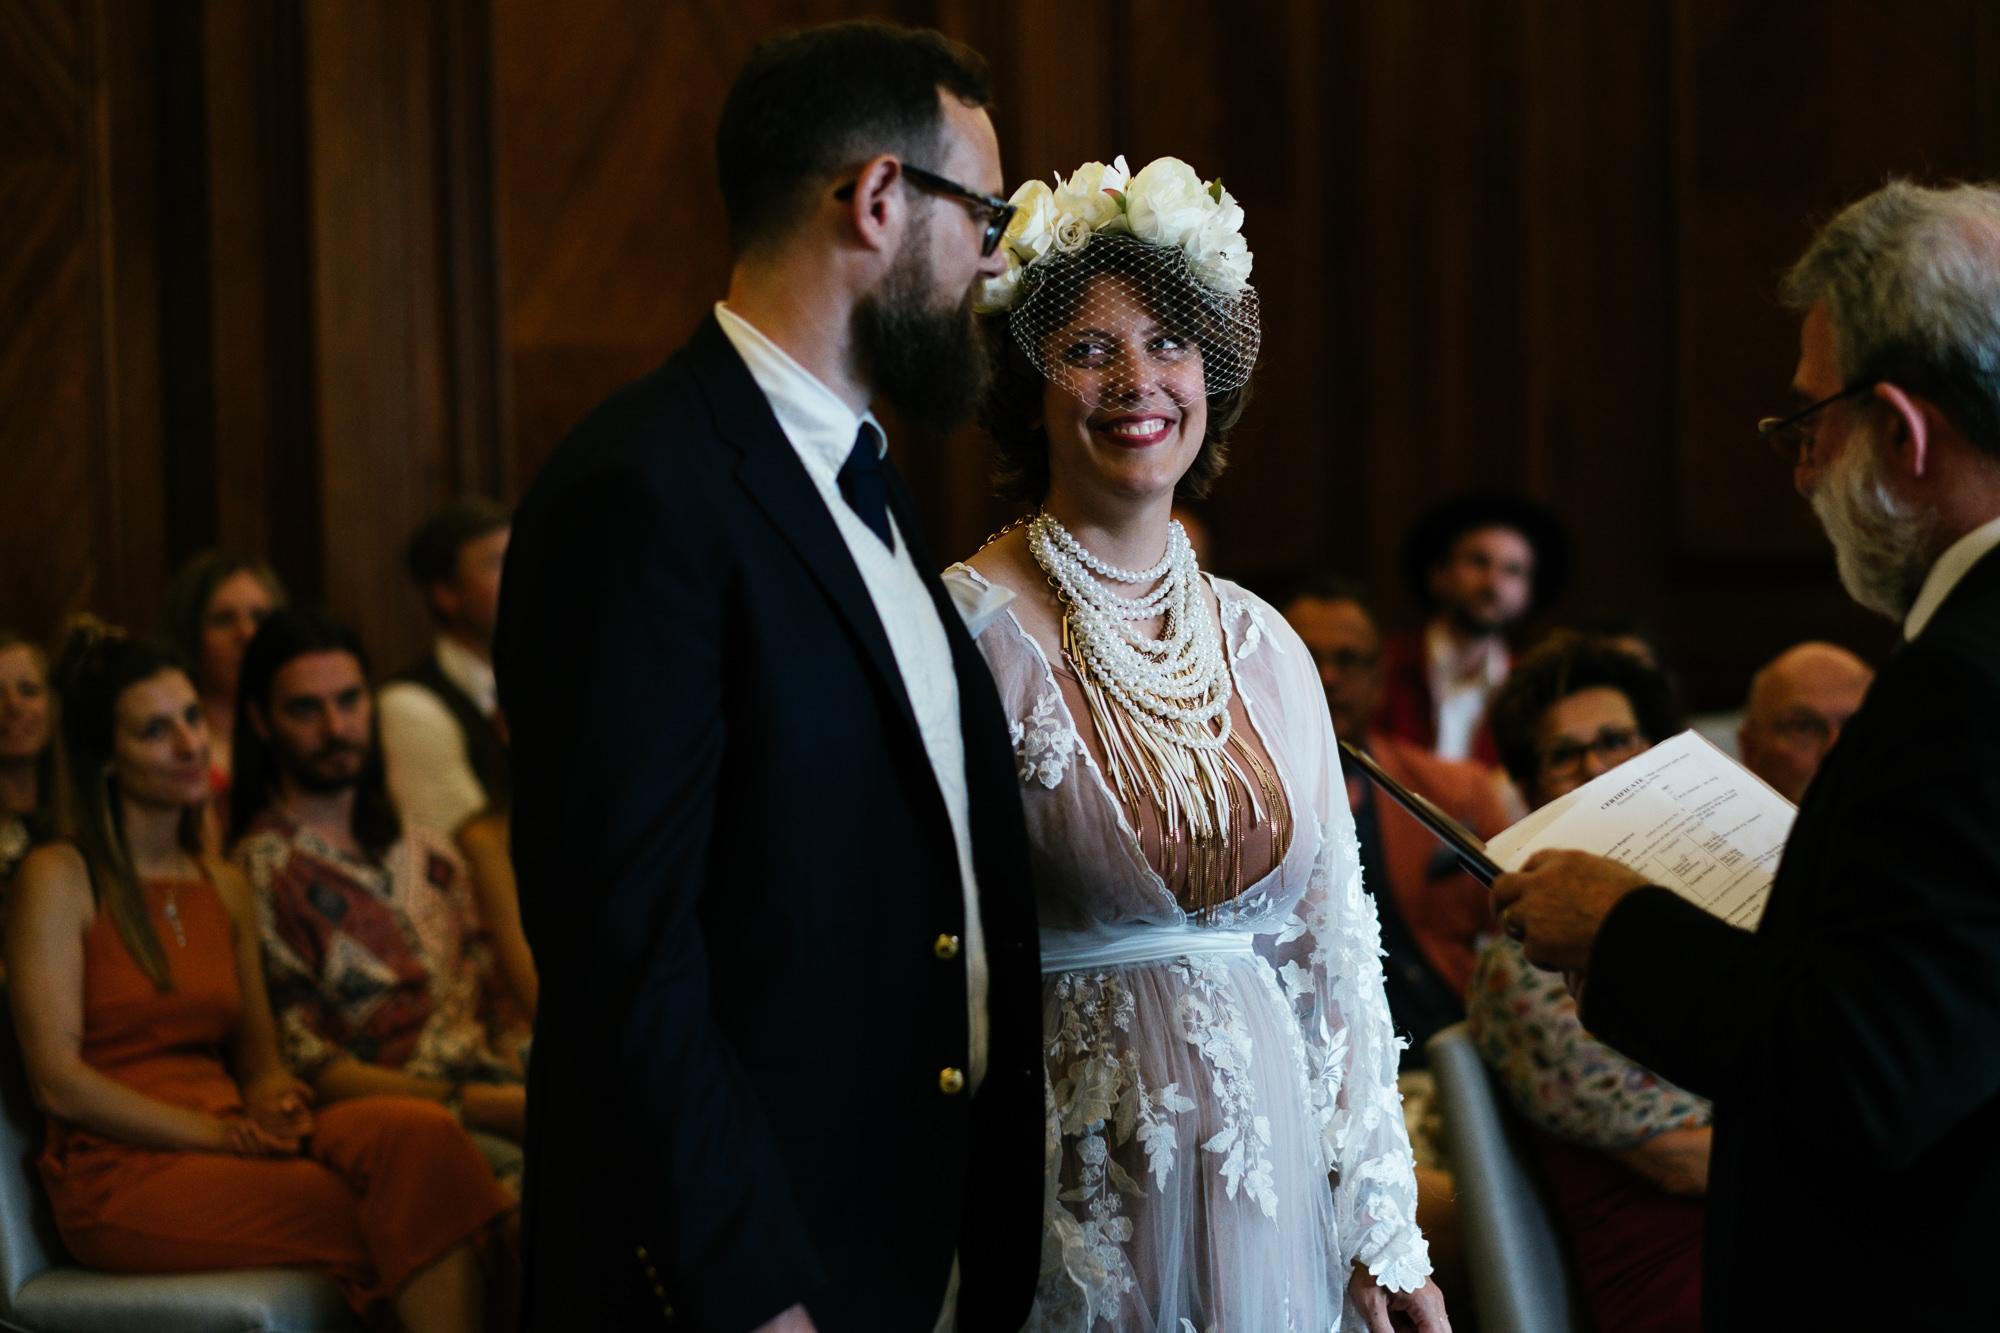 wedding at Marylebone Town Hall